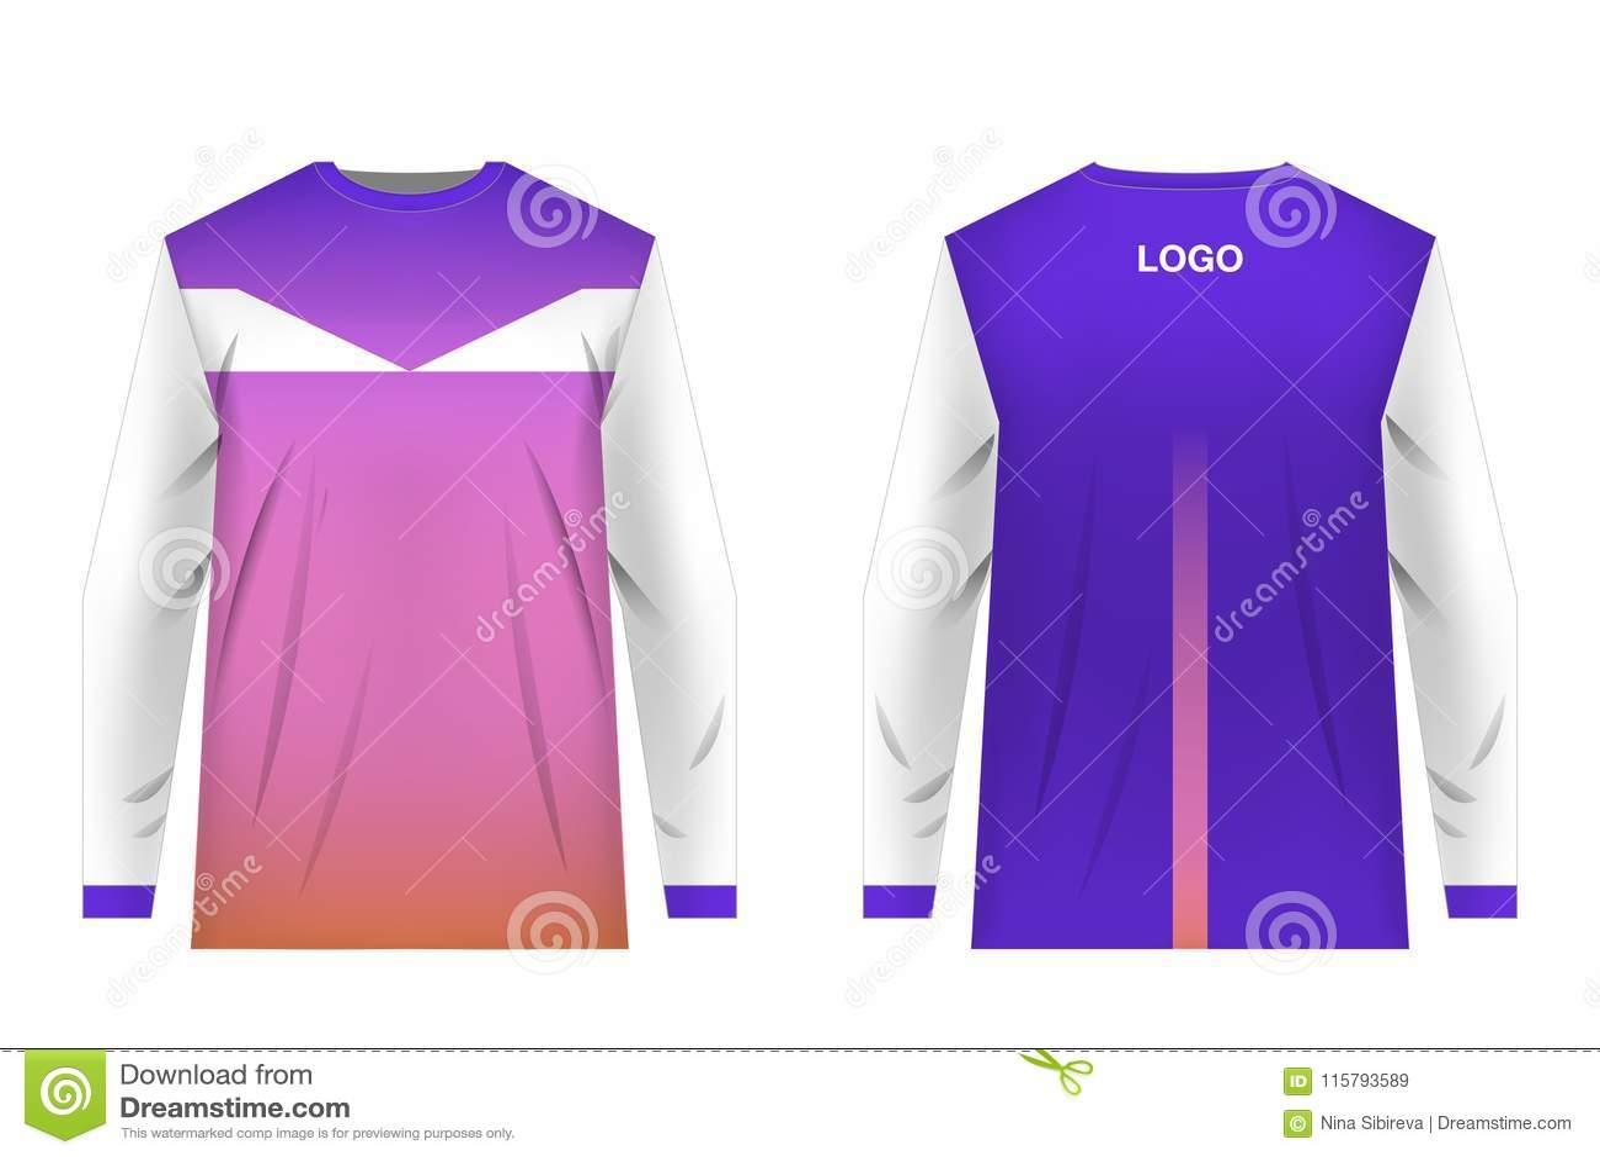 Jersey design sportwear stock illustration. Illustration of cloth ... 4e0d86a13